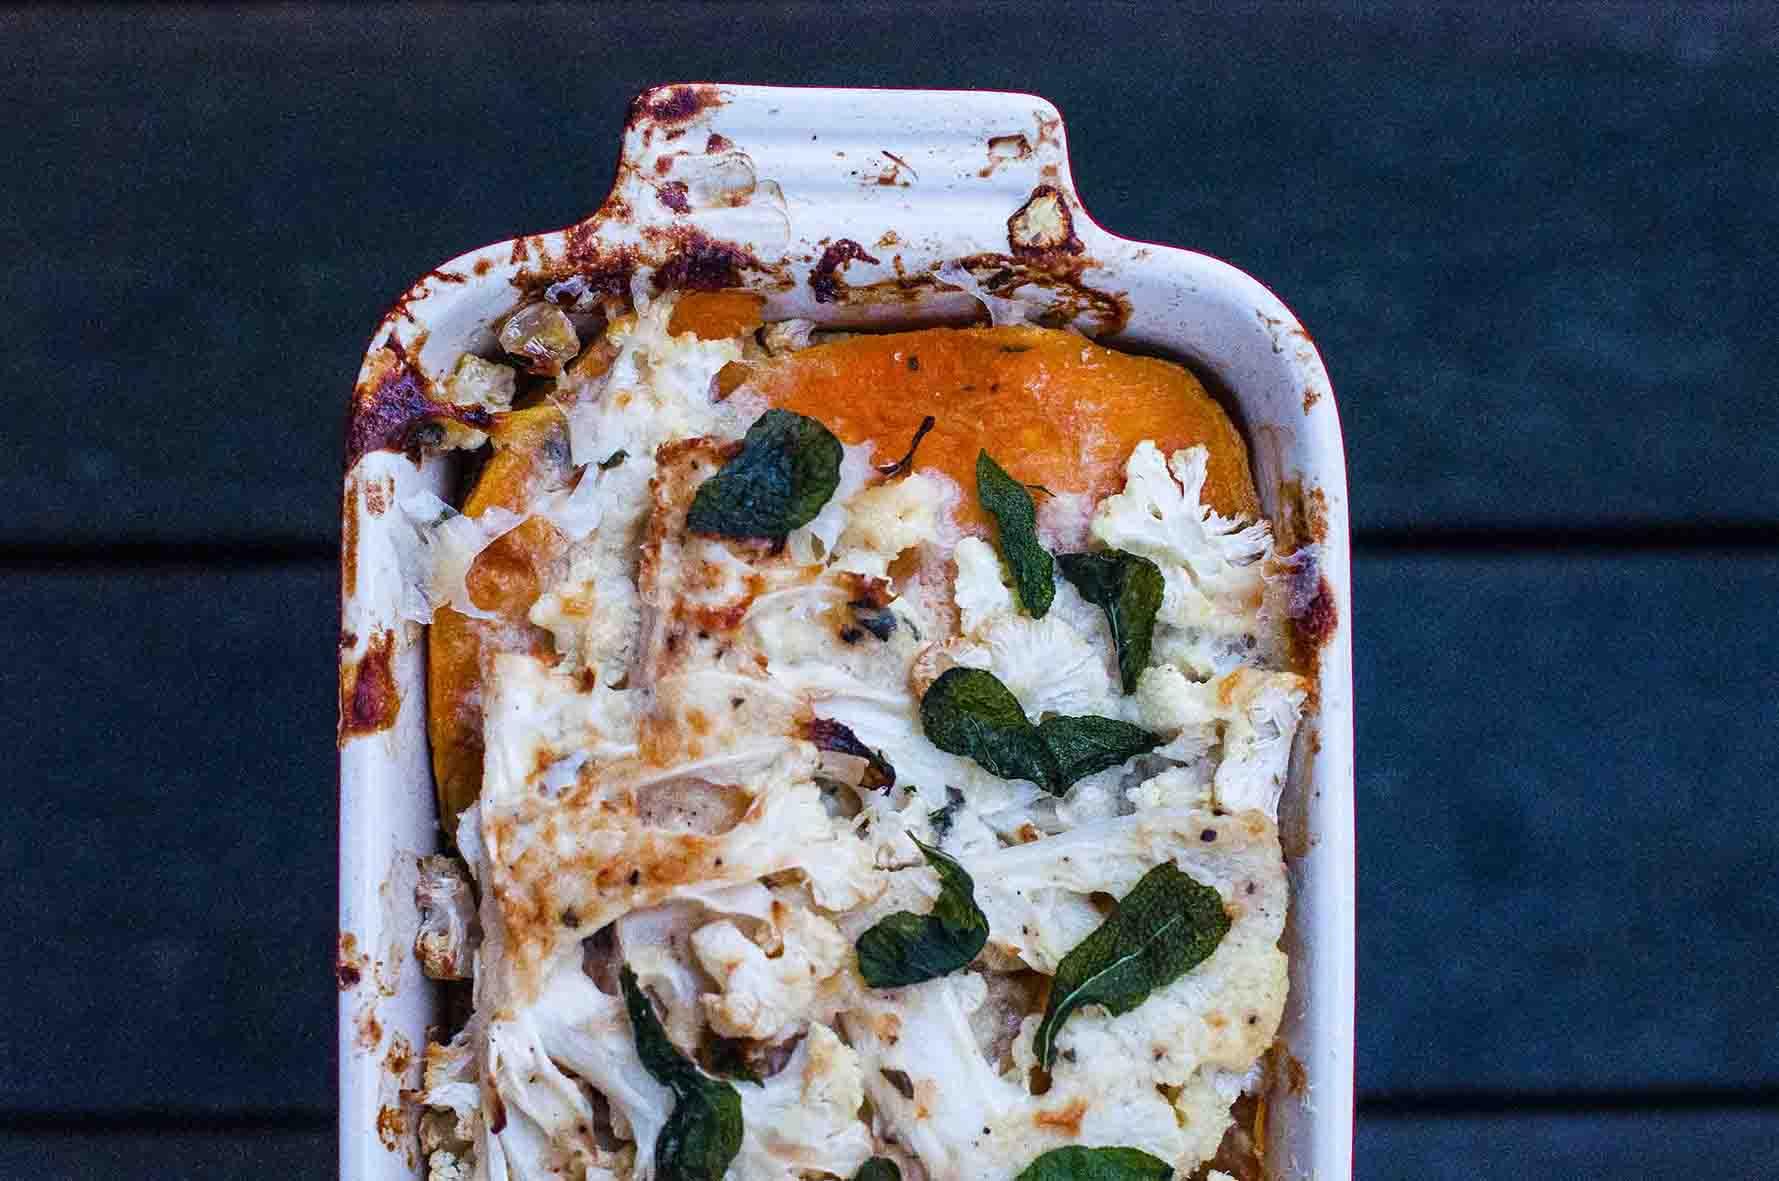 cauliflower-sweet potatoes gratin3-1